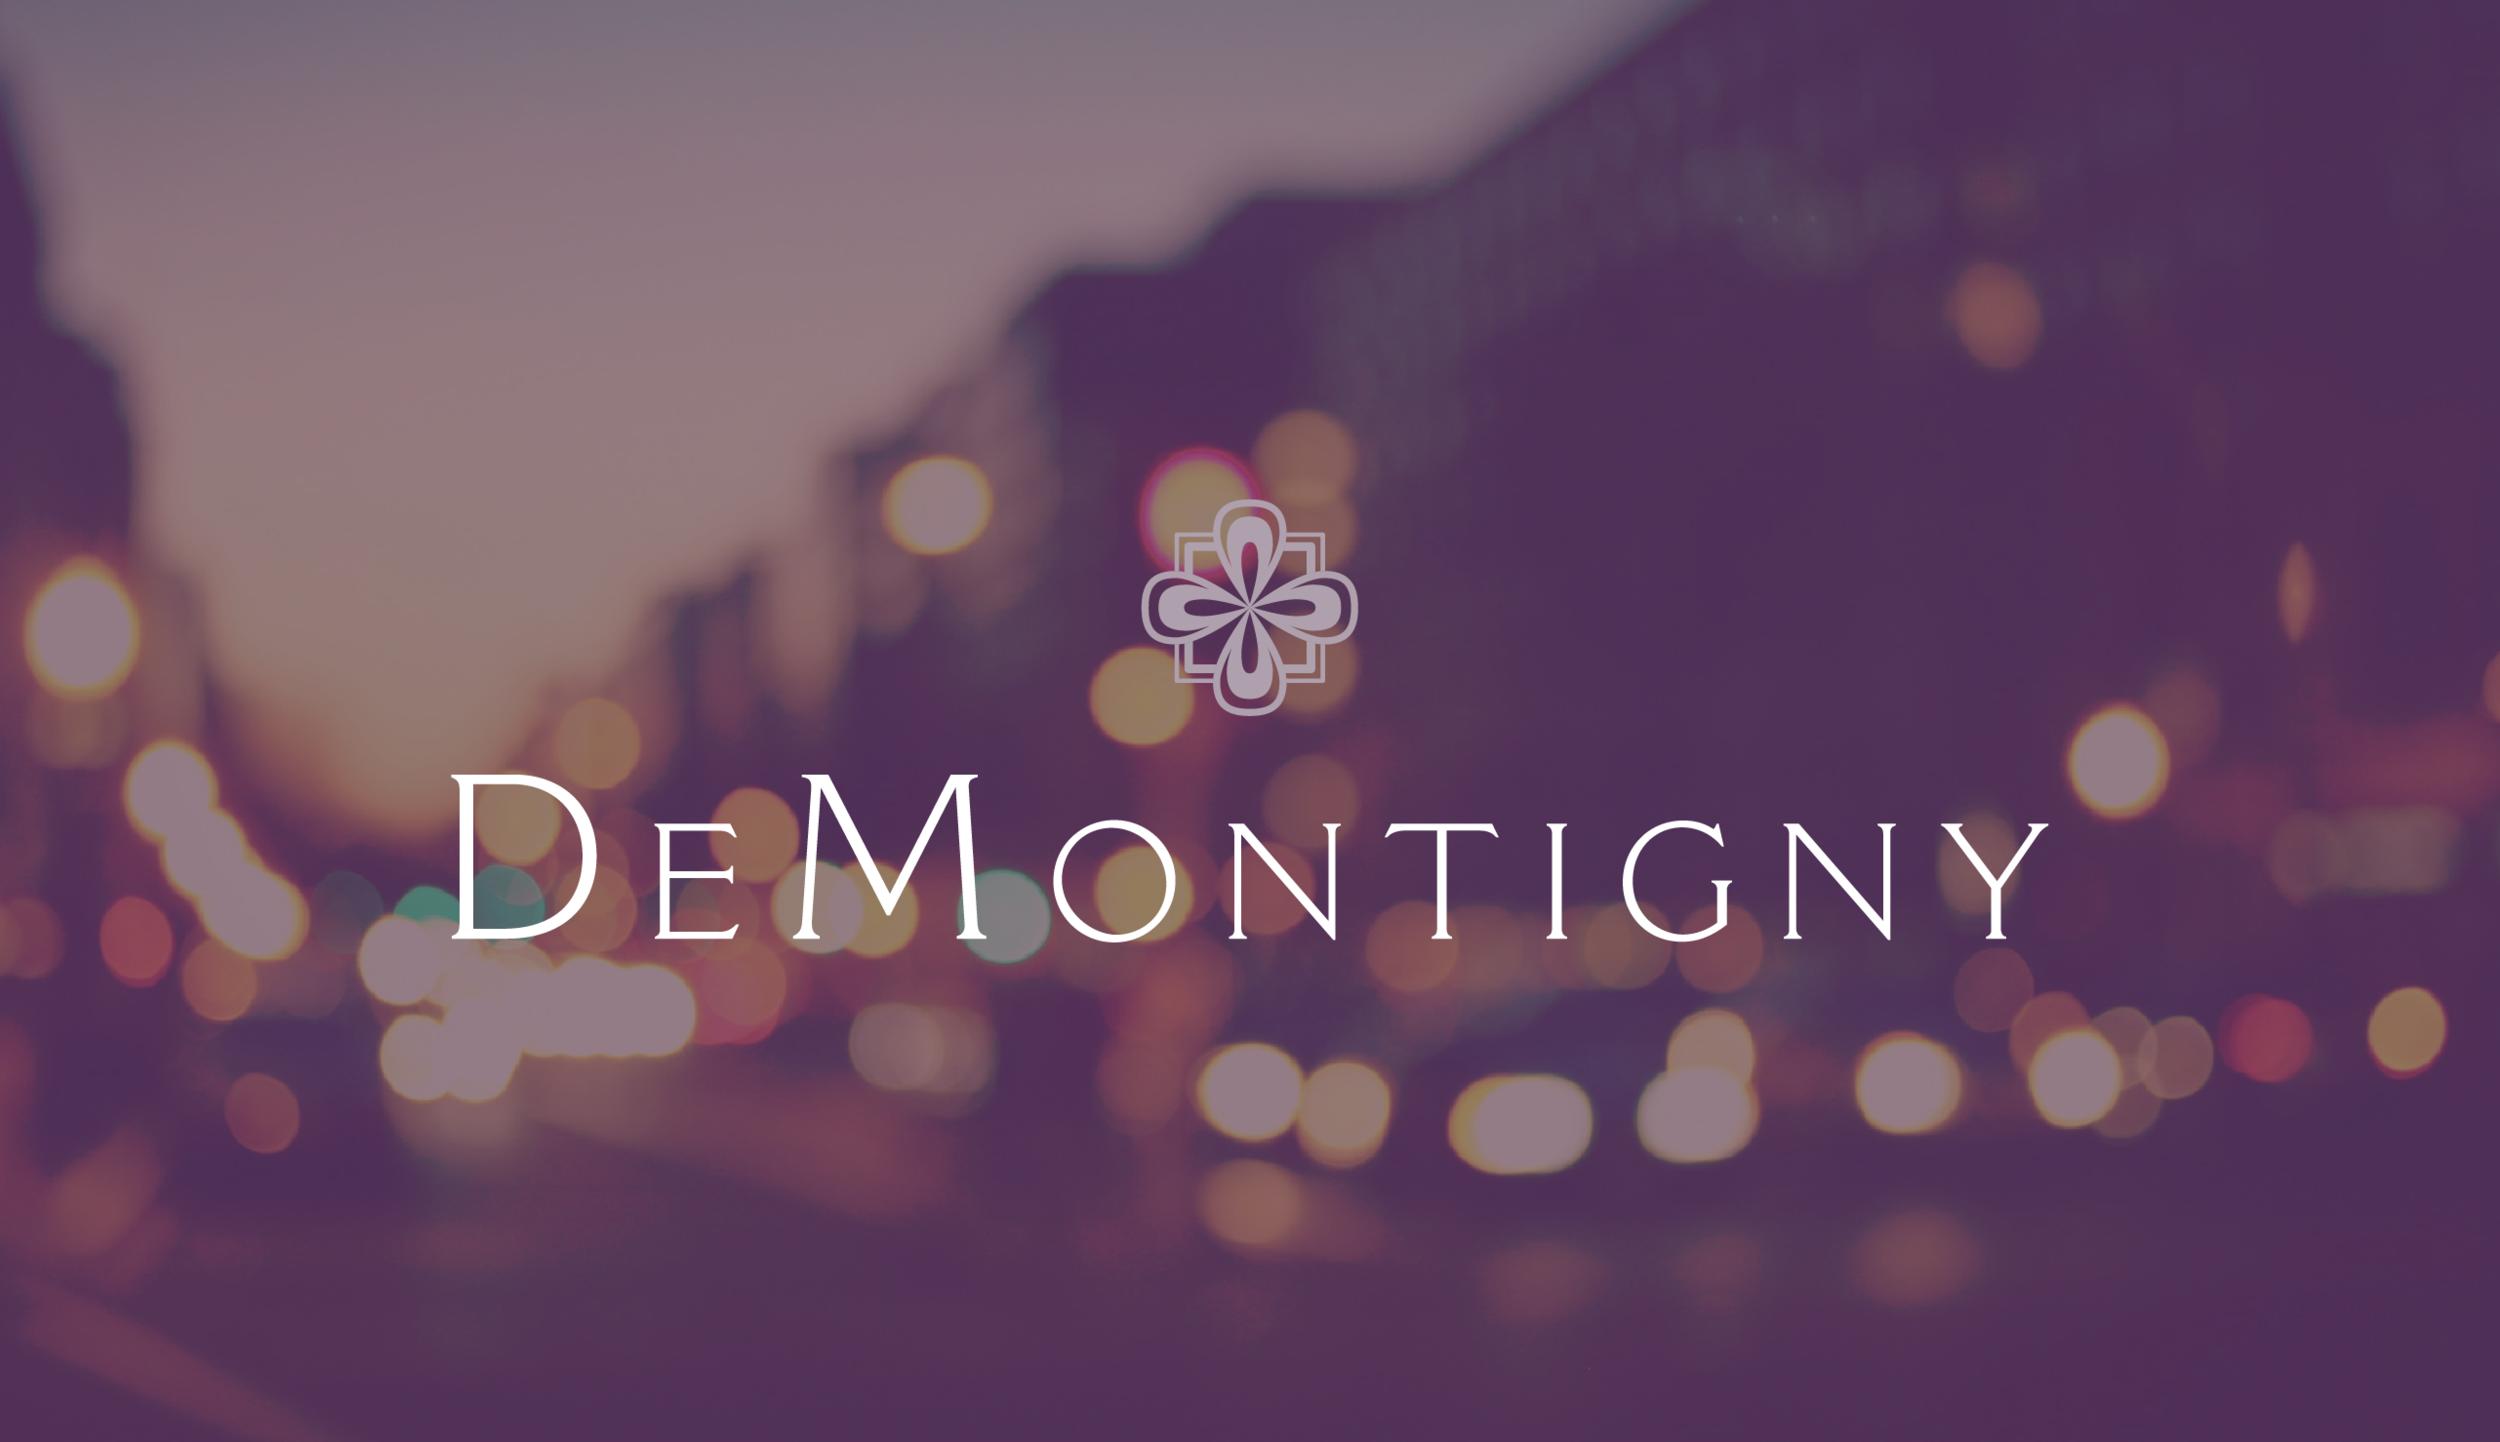 demontigny-photo.png